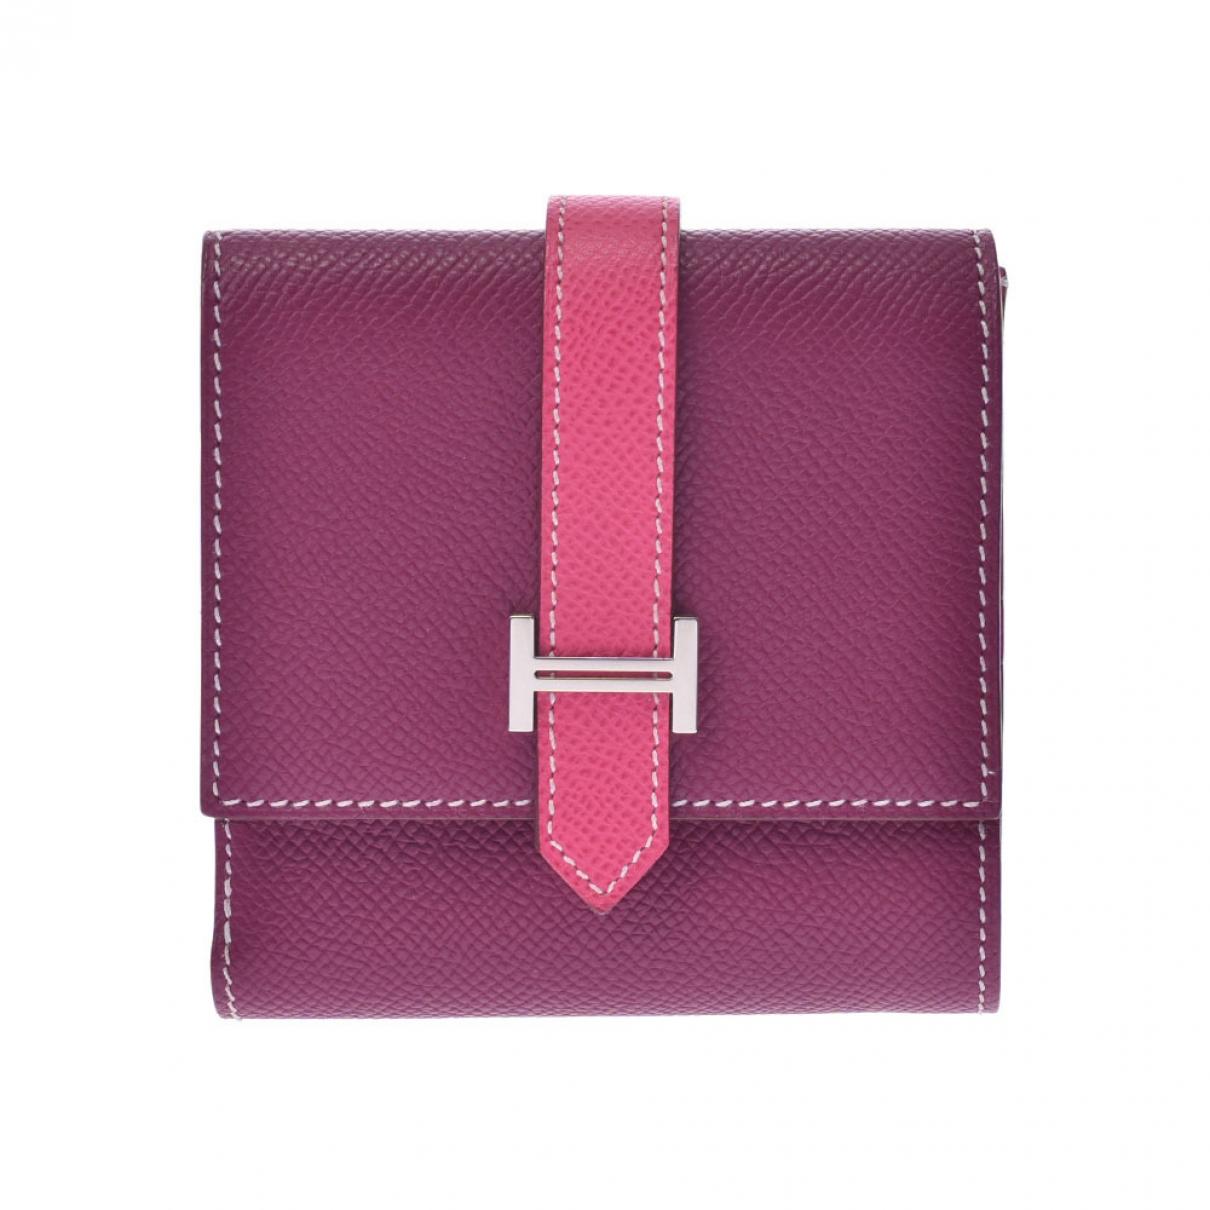 Hermès Béarn Pink Leather wallet for Women \N